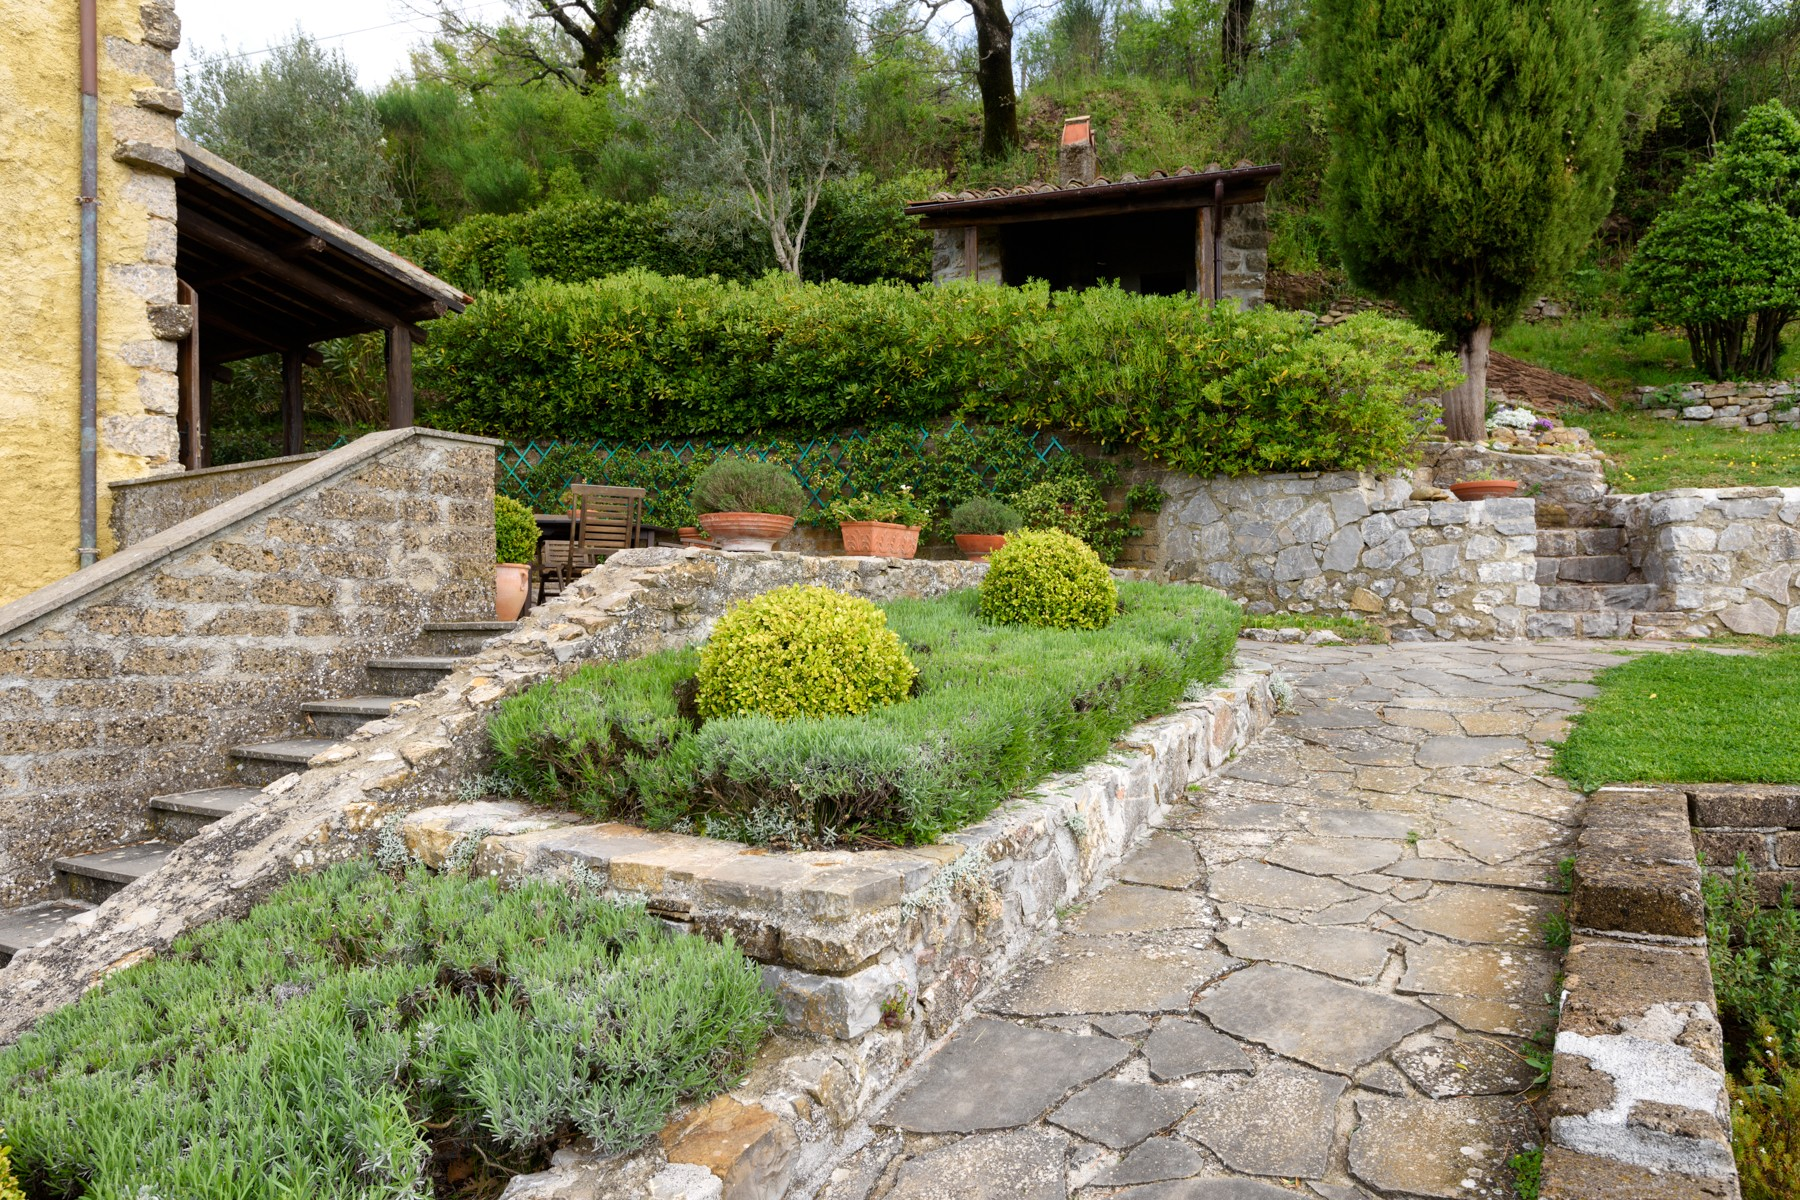 Casa indipendente in Vendita a Semproniano: 4 locali, 220 mq - Foto 6